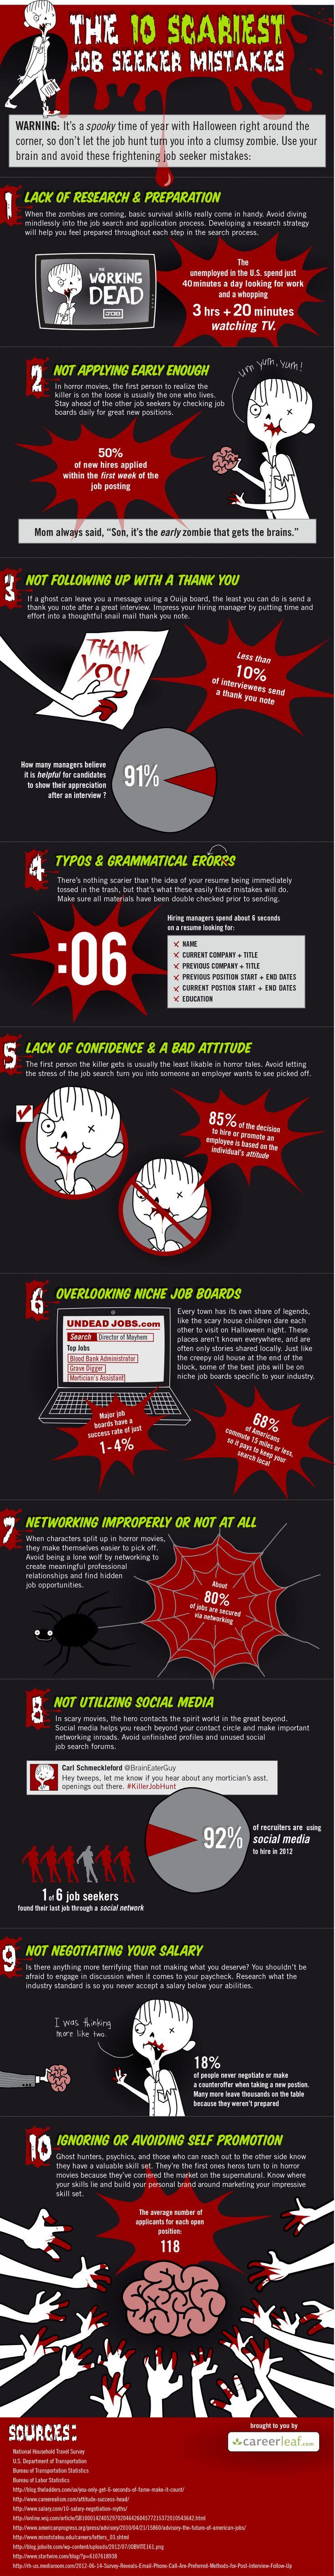 107 best Recruitment Infographics images on Pinterest